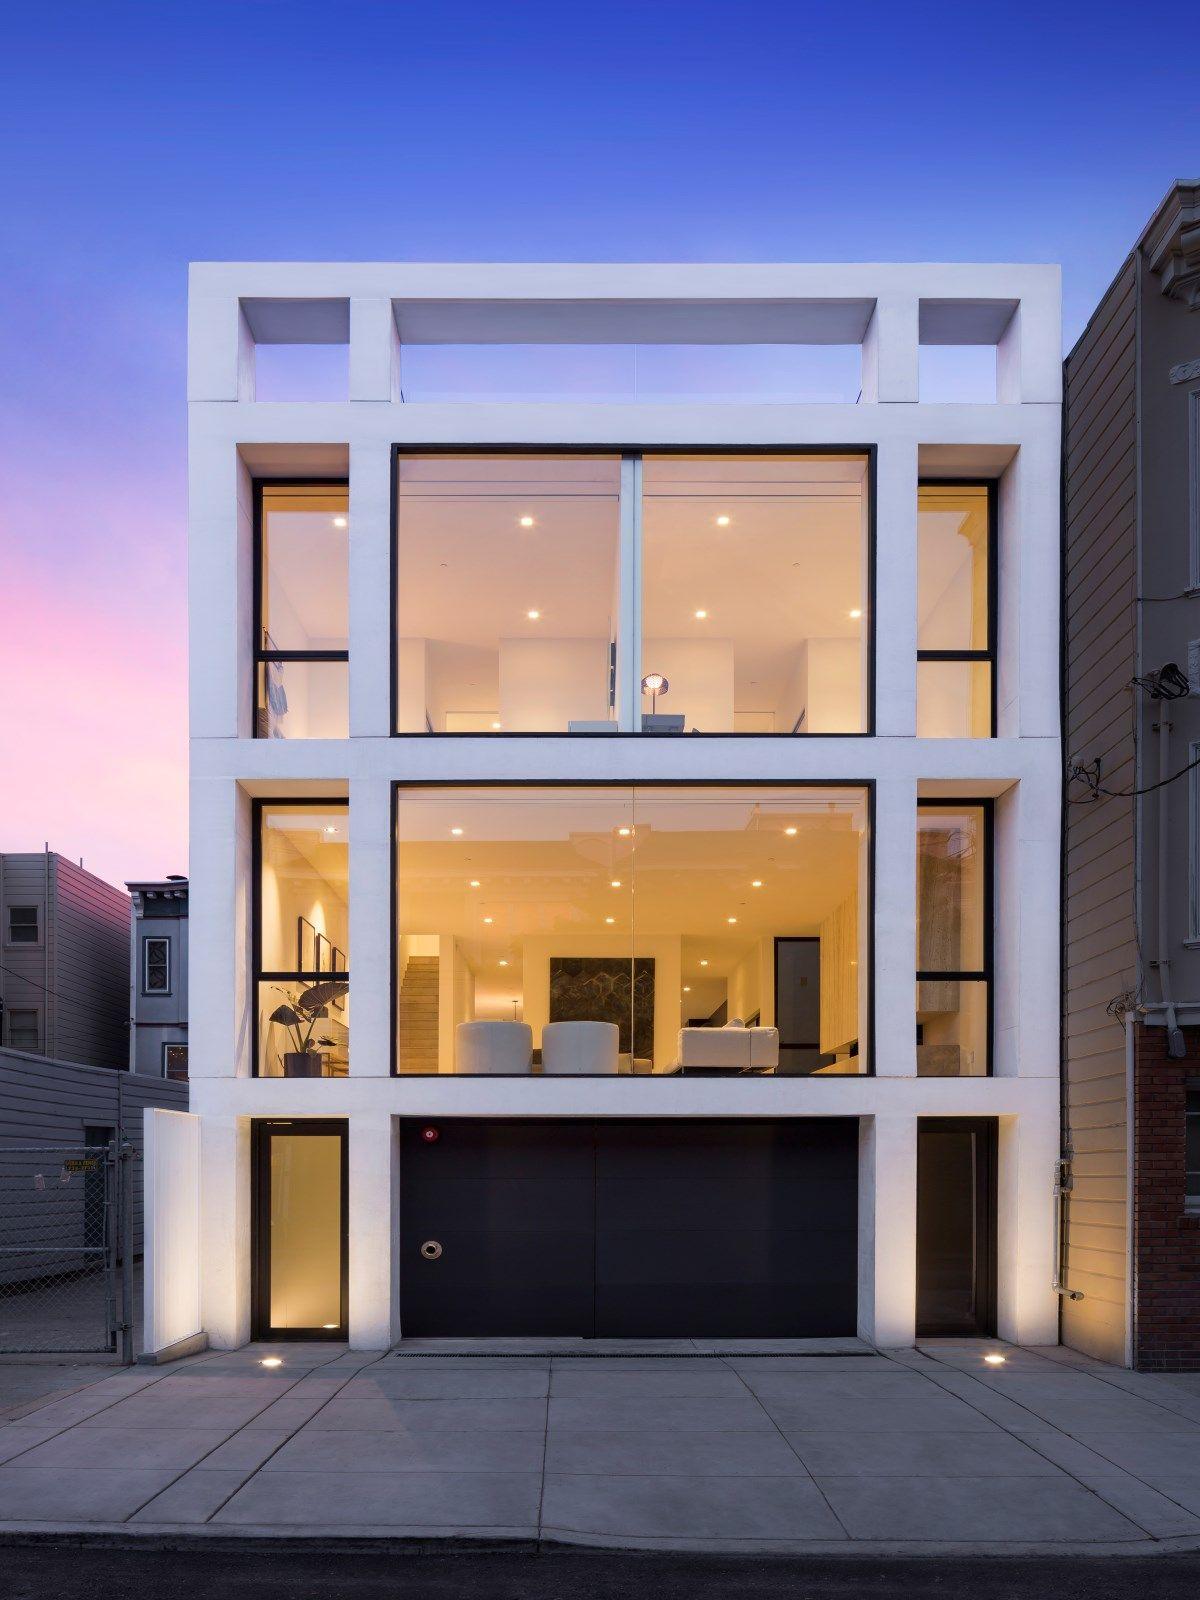 Good 50 Oakwood St San Francisco, CA, 94110   San Francisco Luxury Homes For Sale